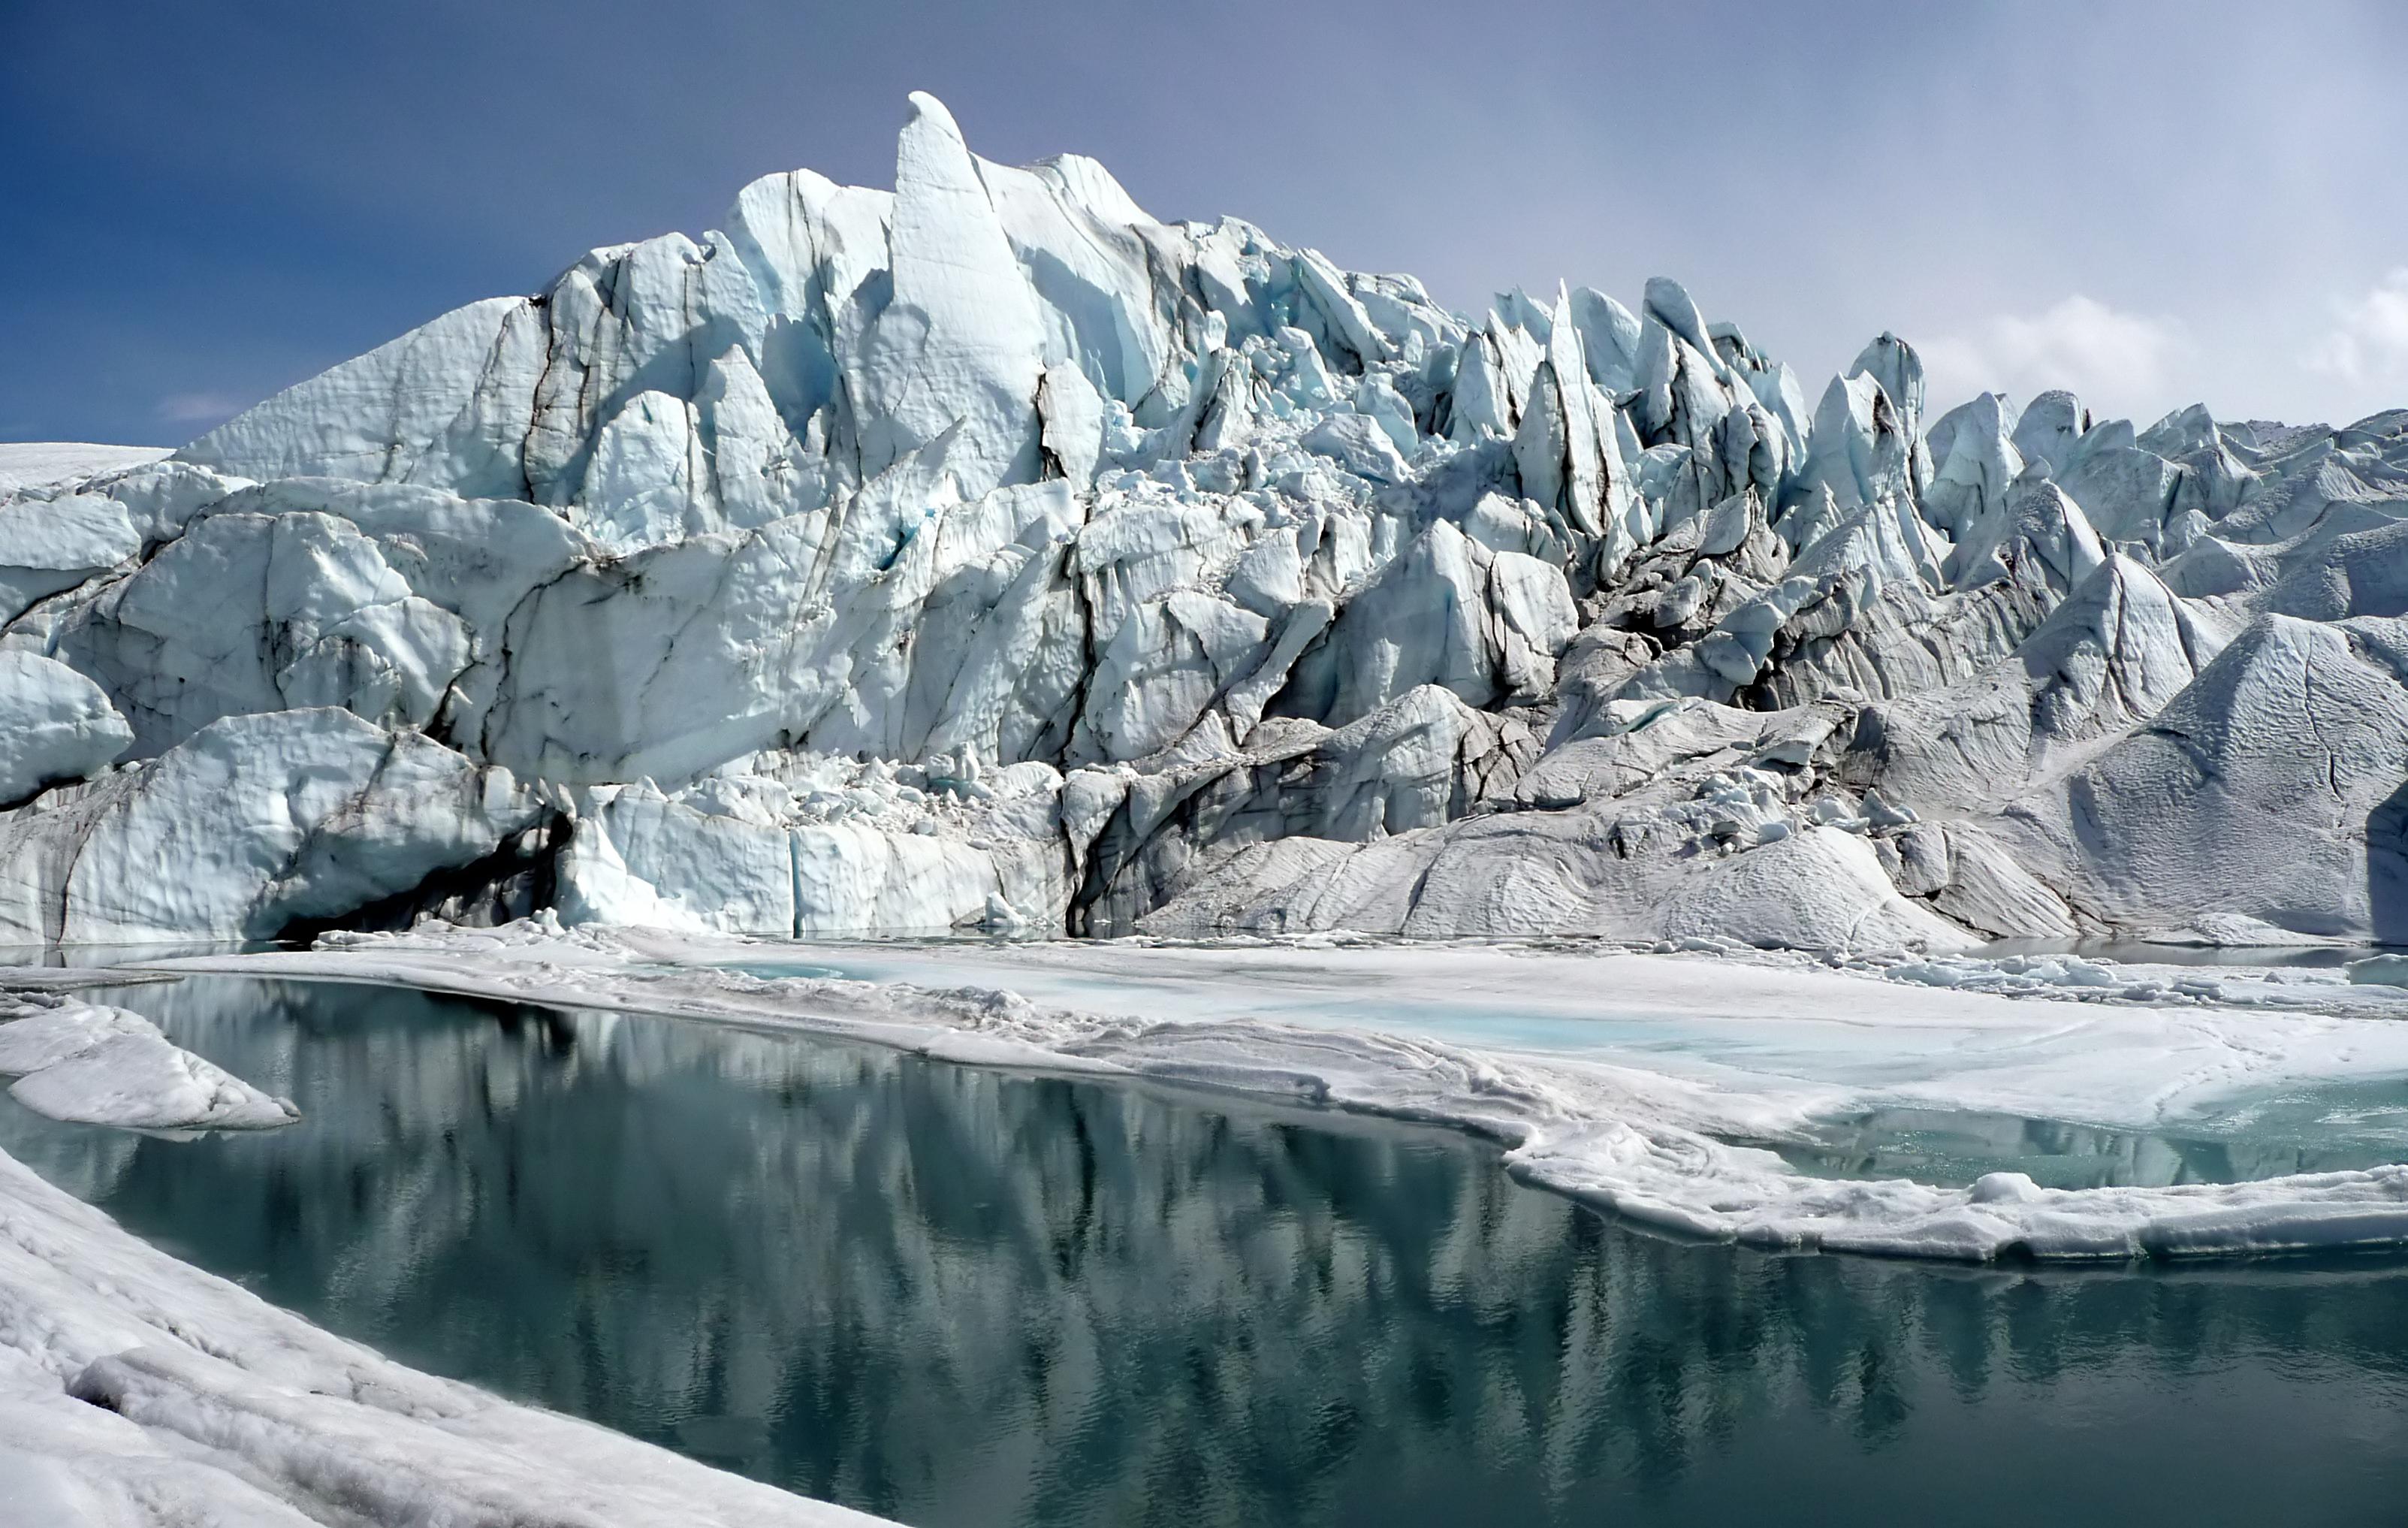 Glacier HD wallpapers, Desktop wallpaper - most viewed